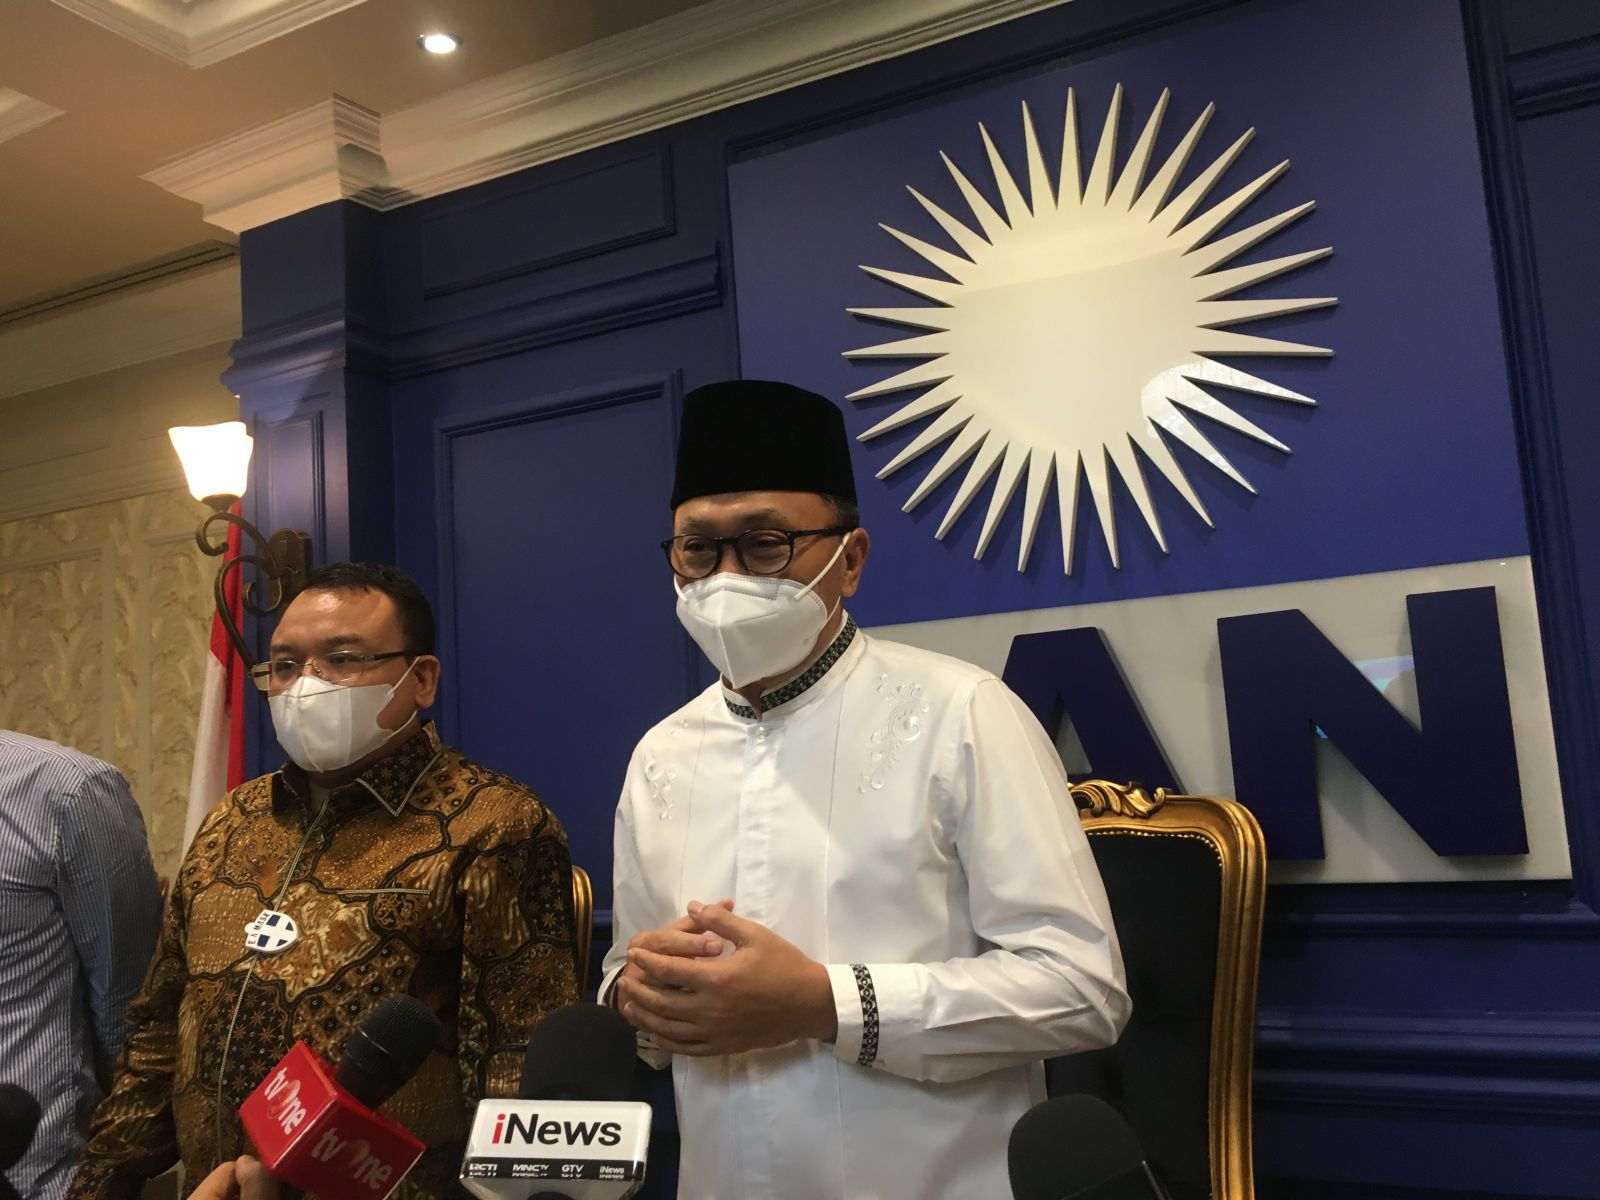 Bencana Belum Tuntas, PAN Kesal DPR Fokus ke Revisi UU Pemilu